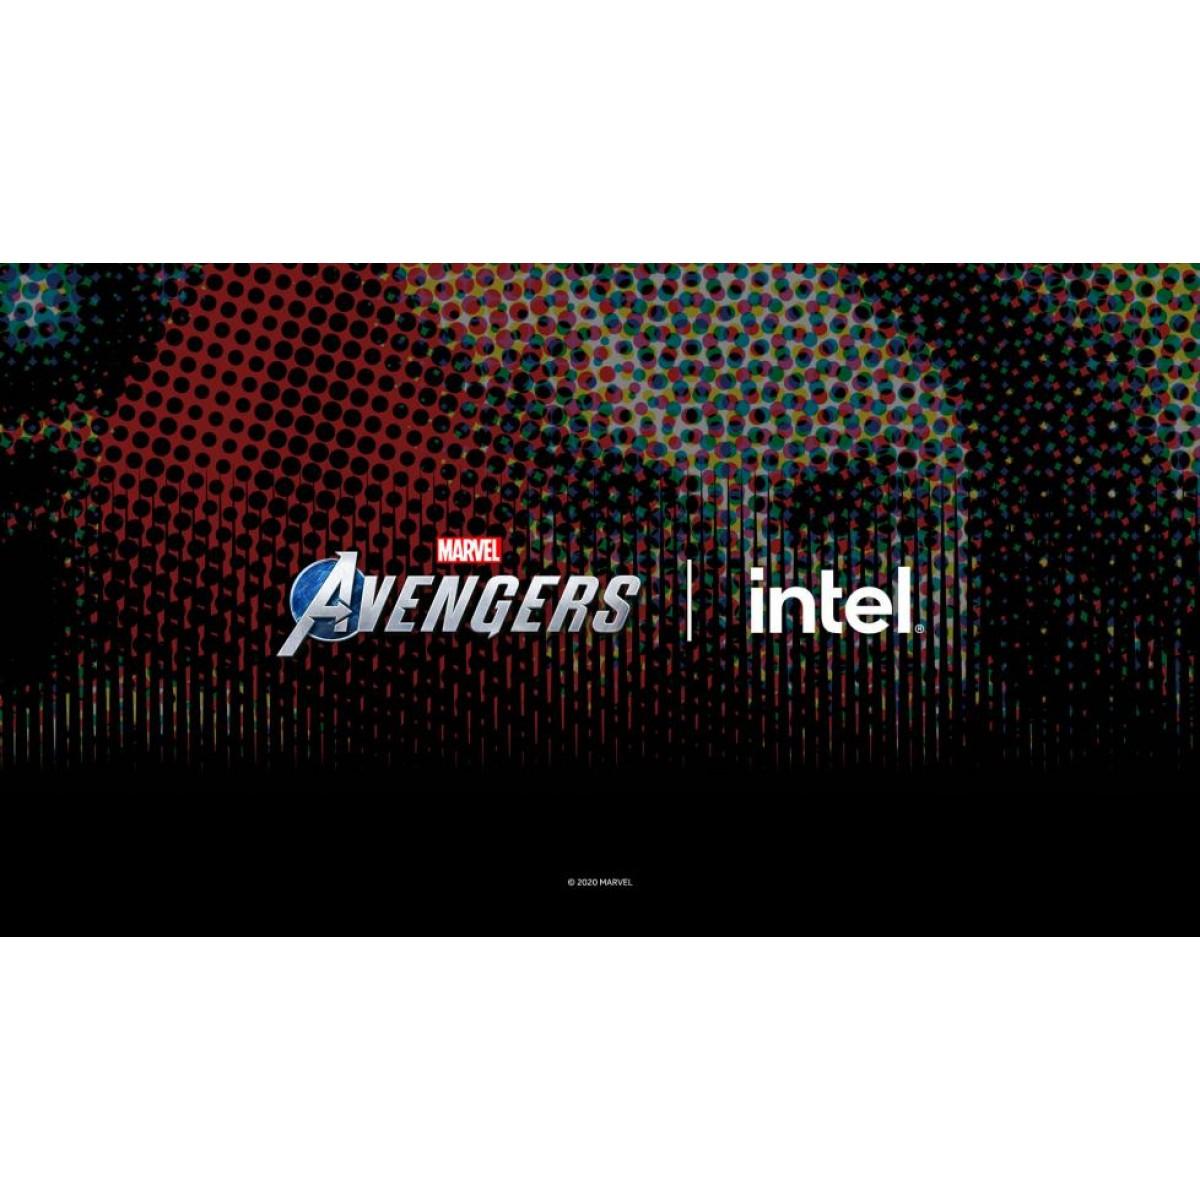 Processador Intel, Core i9 10850KA Avengers Edition, 3.6GHz (5.2GHz Turbo), 10 Cores, 20 Threads, LGA 1200, BX8070110850KA, C/ Vídeo, S/Cooler